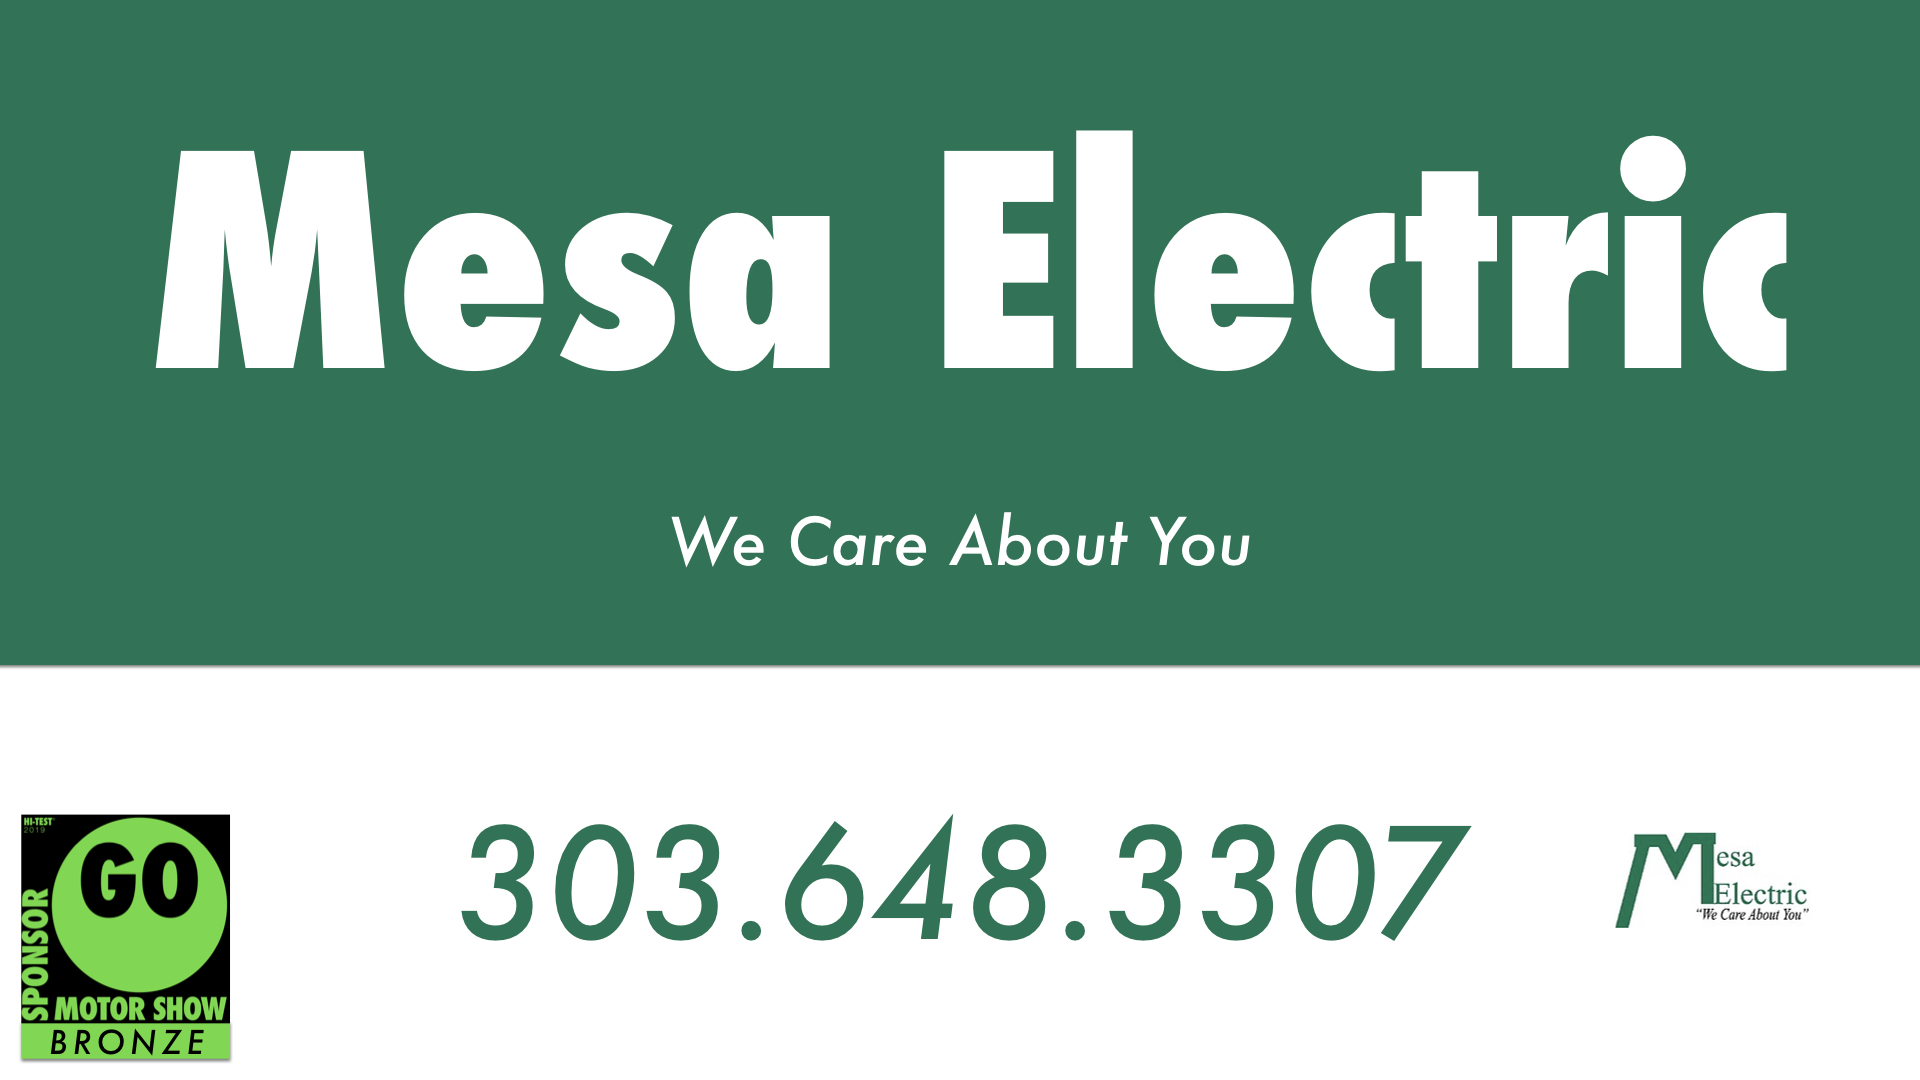 Mesa Electric